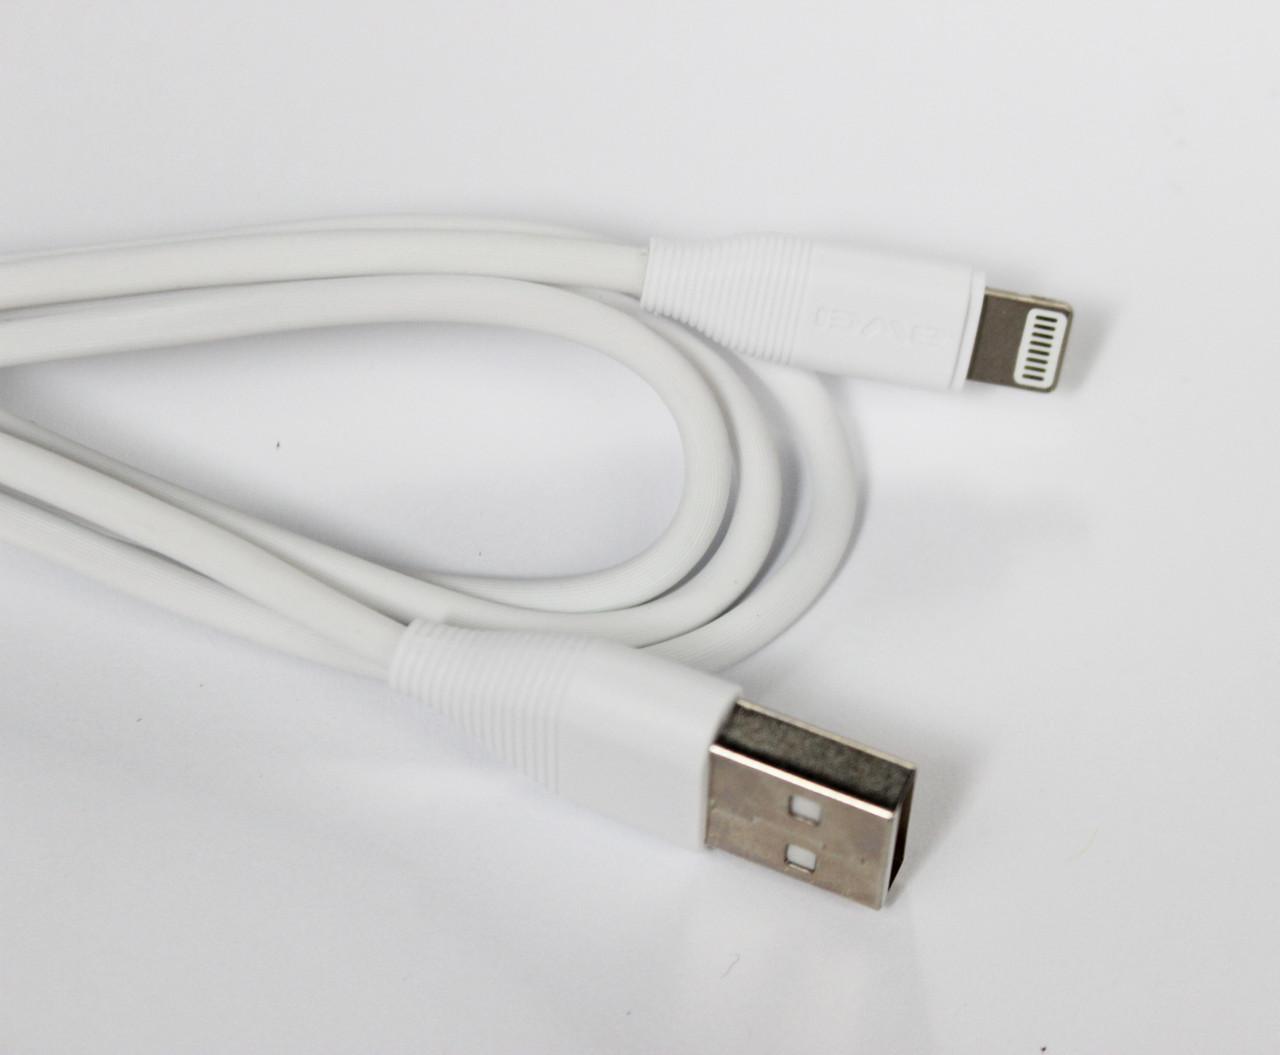 Кабель Awei CL-93 USB - Lightning 1 м White (77703202_1)